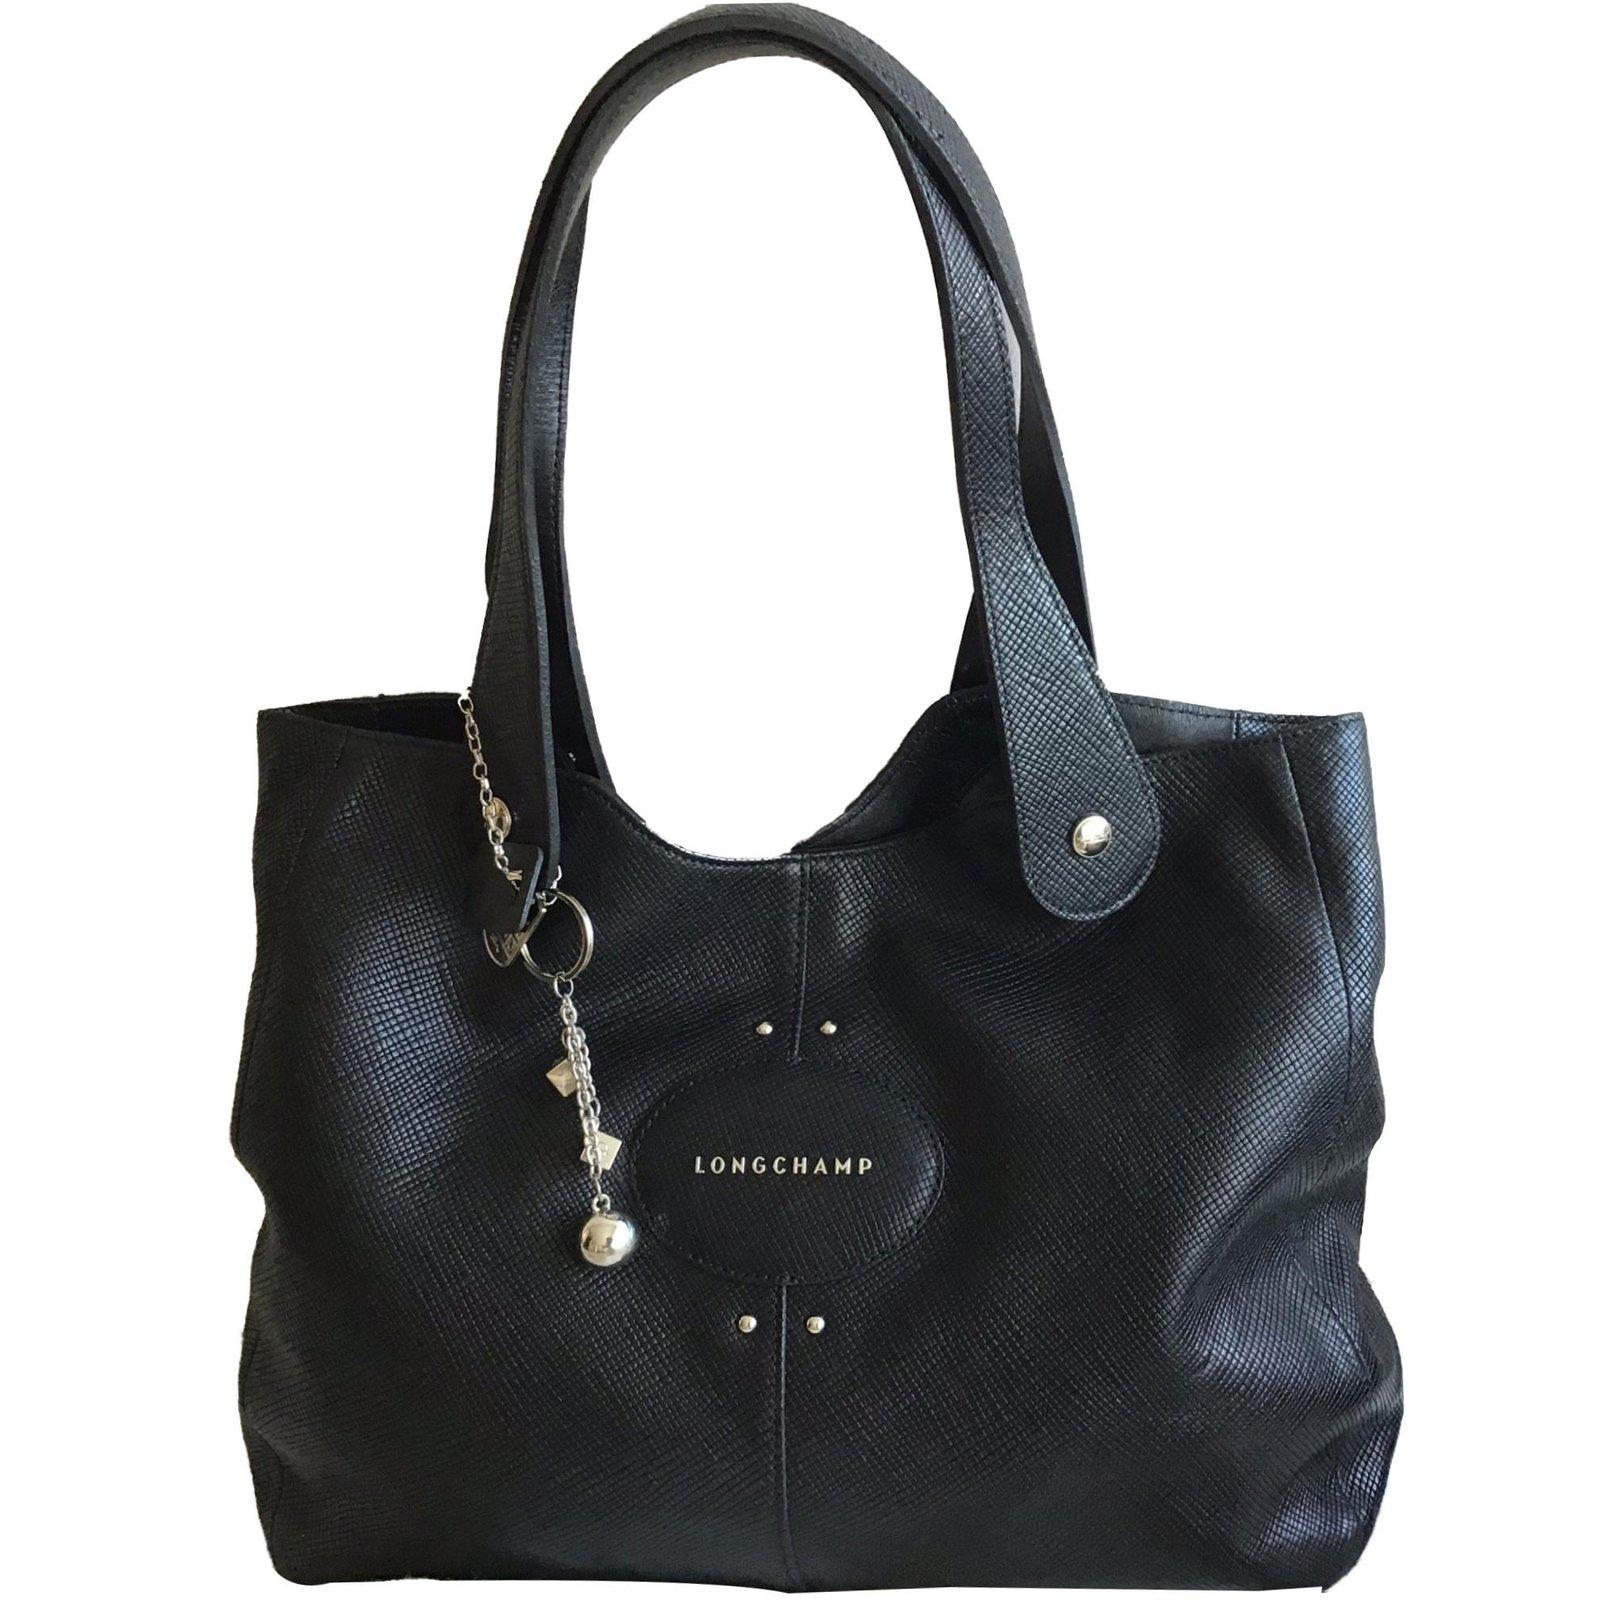 a910a18189a Longchamp Handbags Handbags Leather Black ref.80578 - Joli Closet